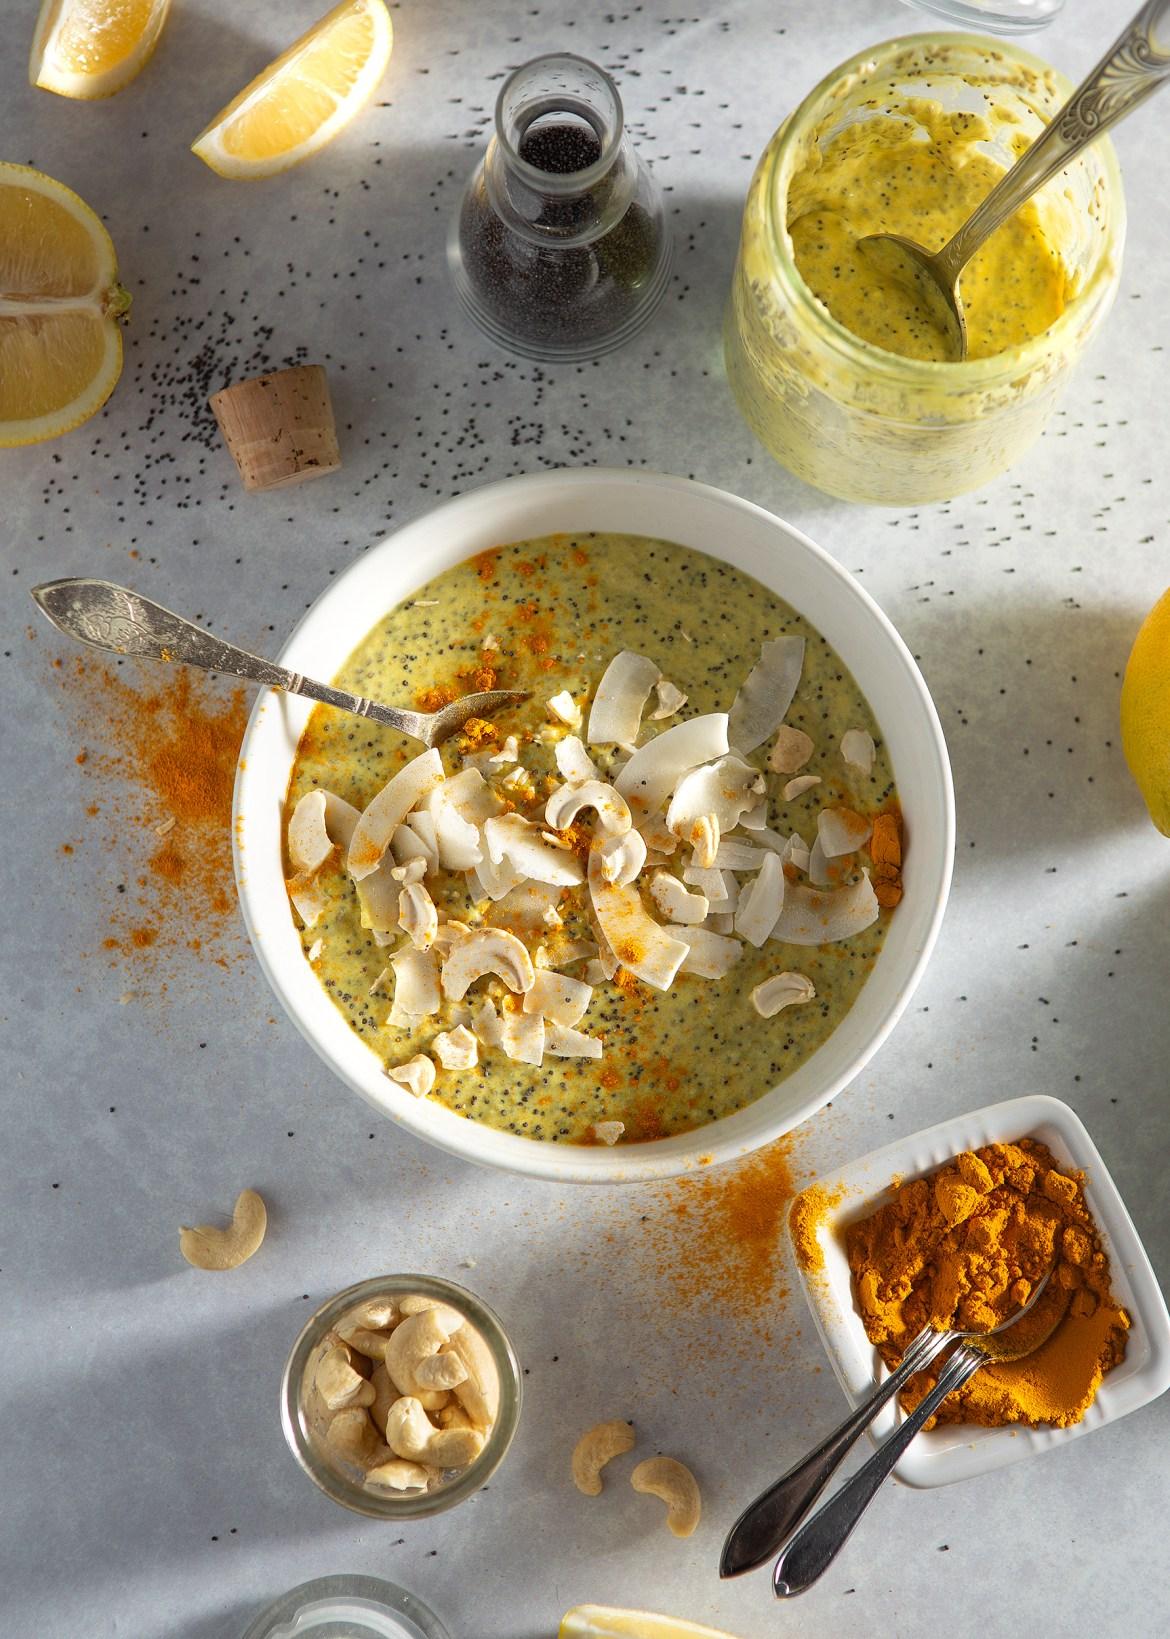 Paleo Lemon Curd Chia Pudding with Poppyseeds